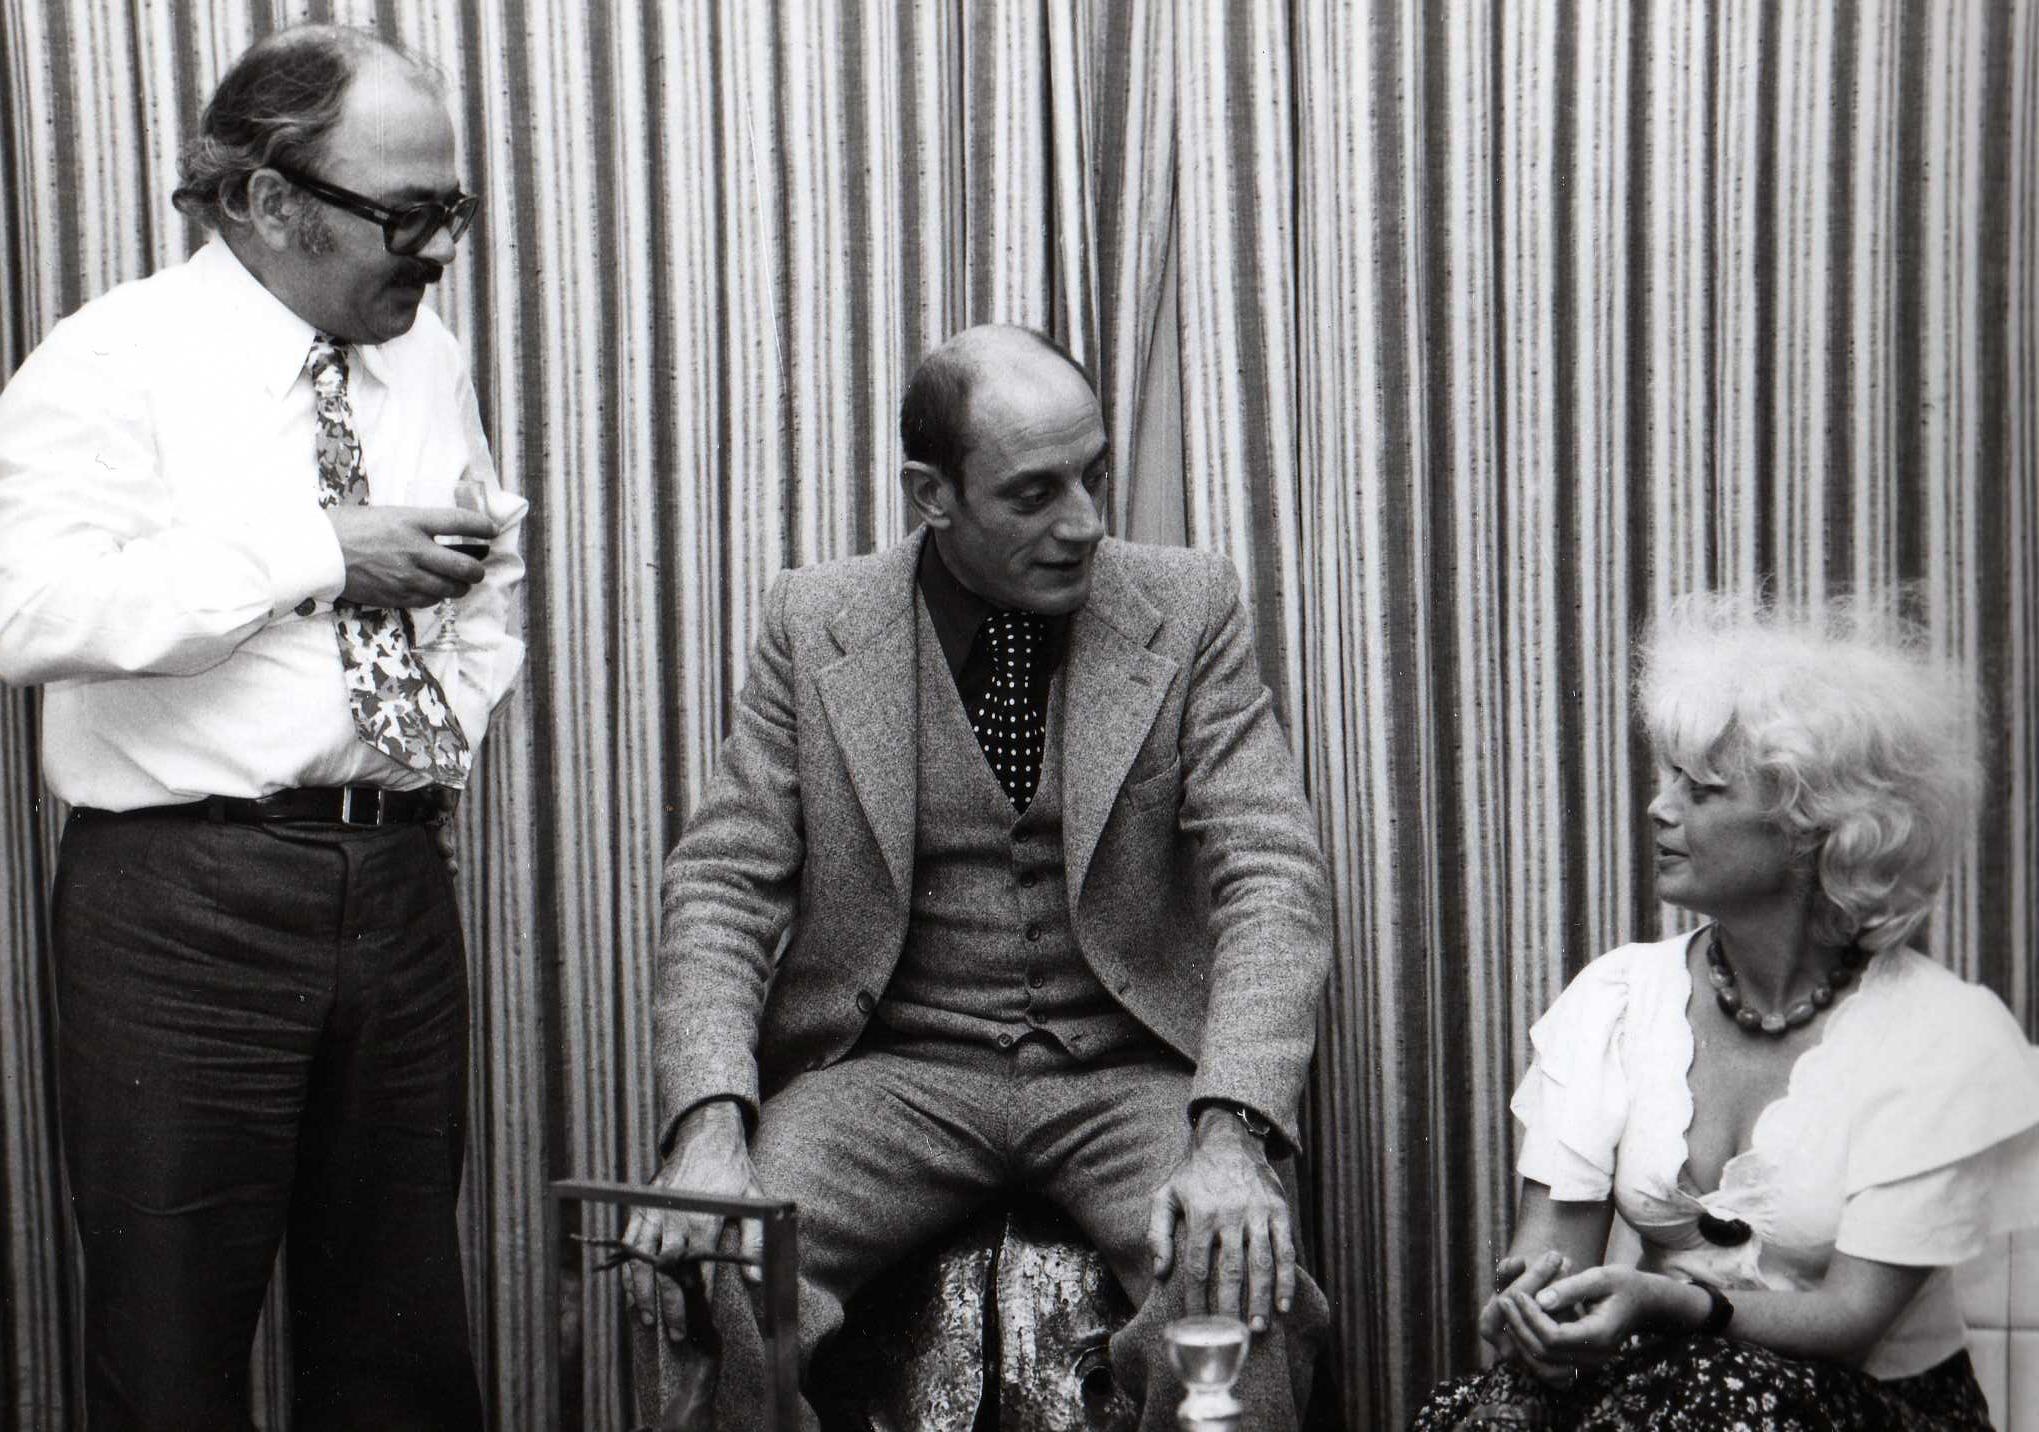 Jo 1976 P Snoeck - F Urbin Choffray